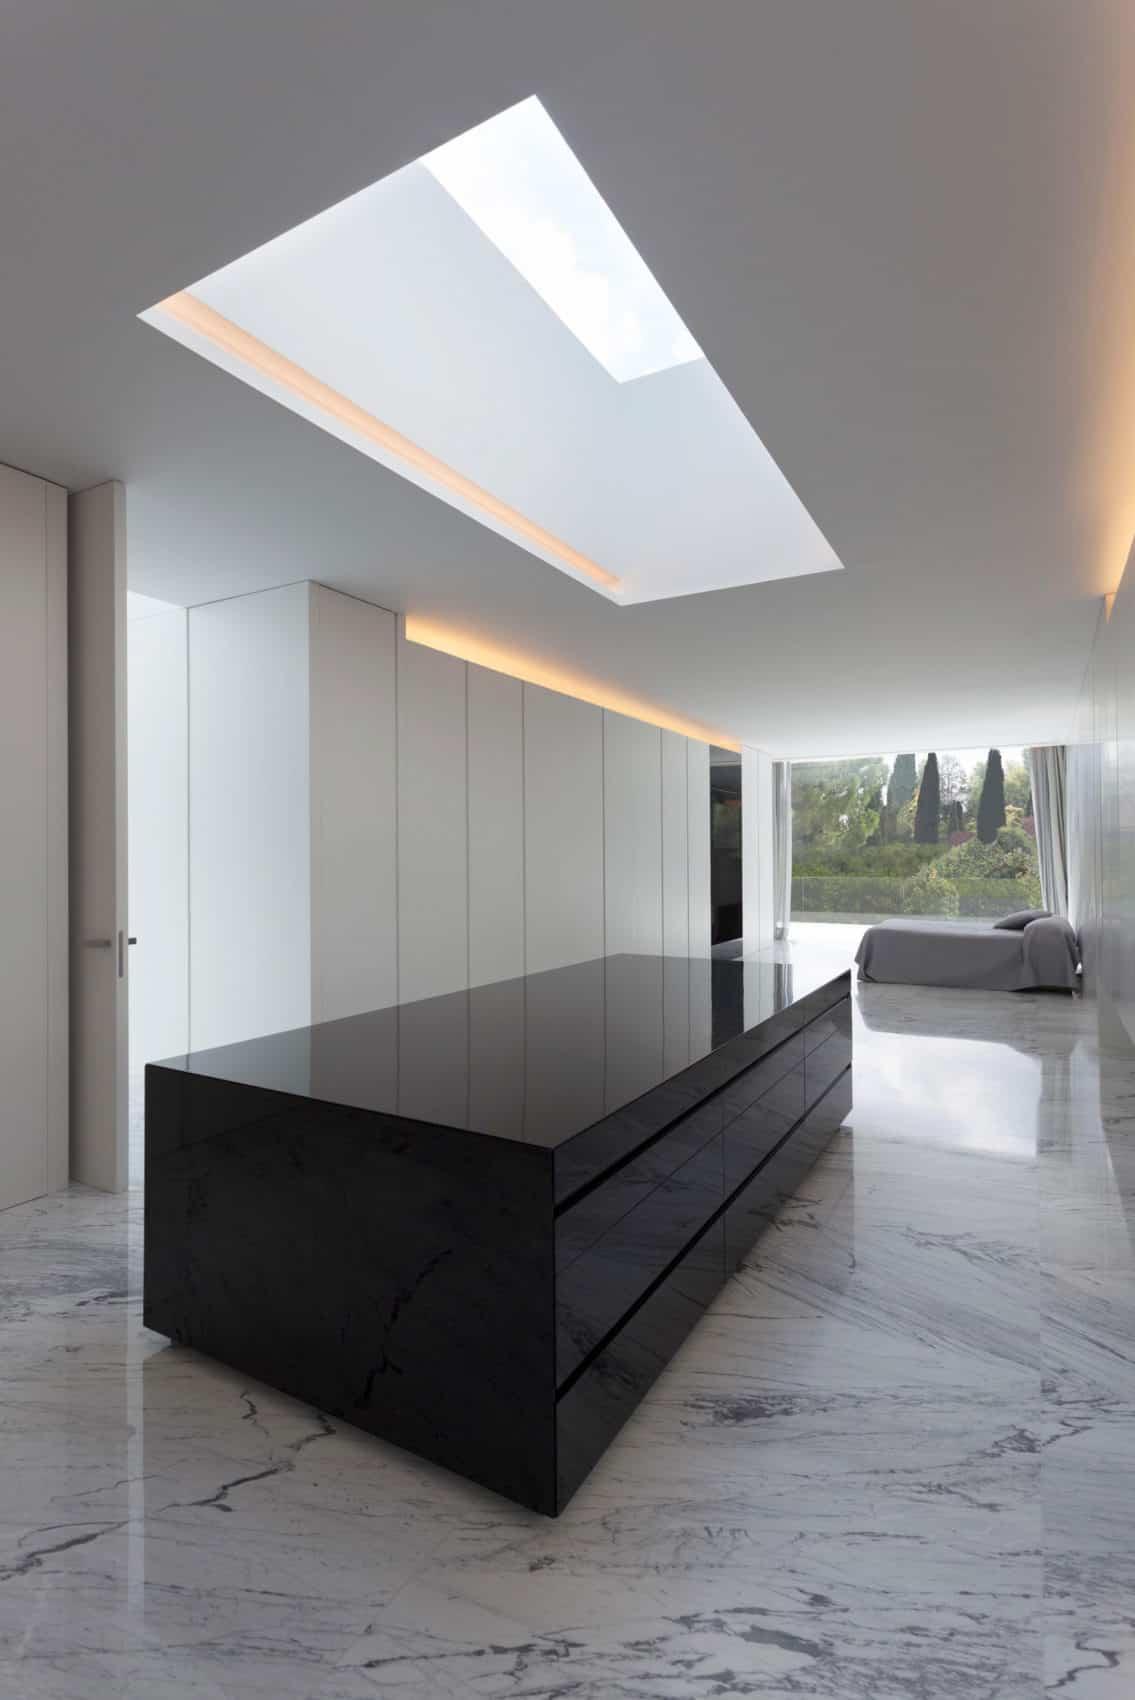 Aluminum House by Fran Silvestre Arquitectos (22)